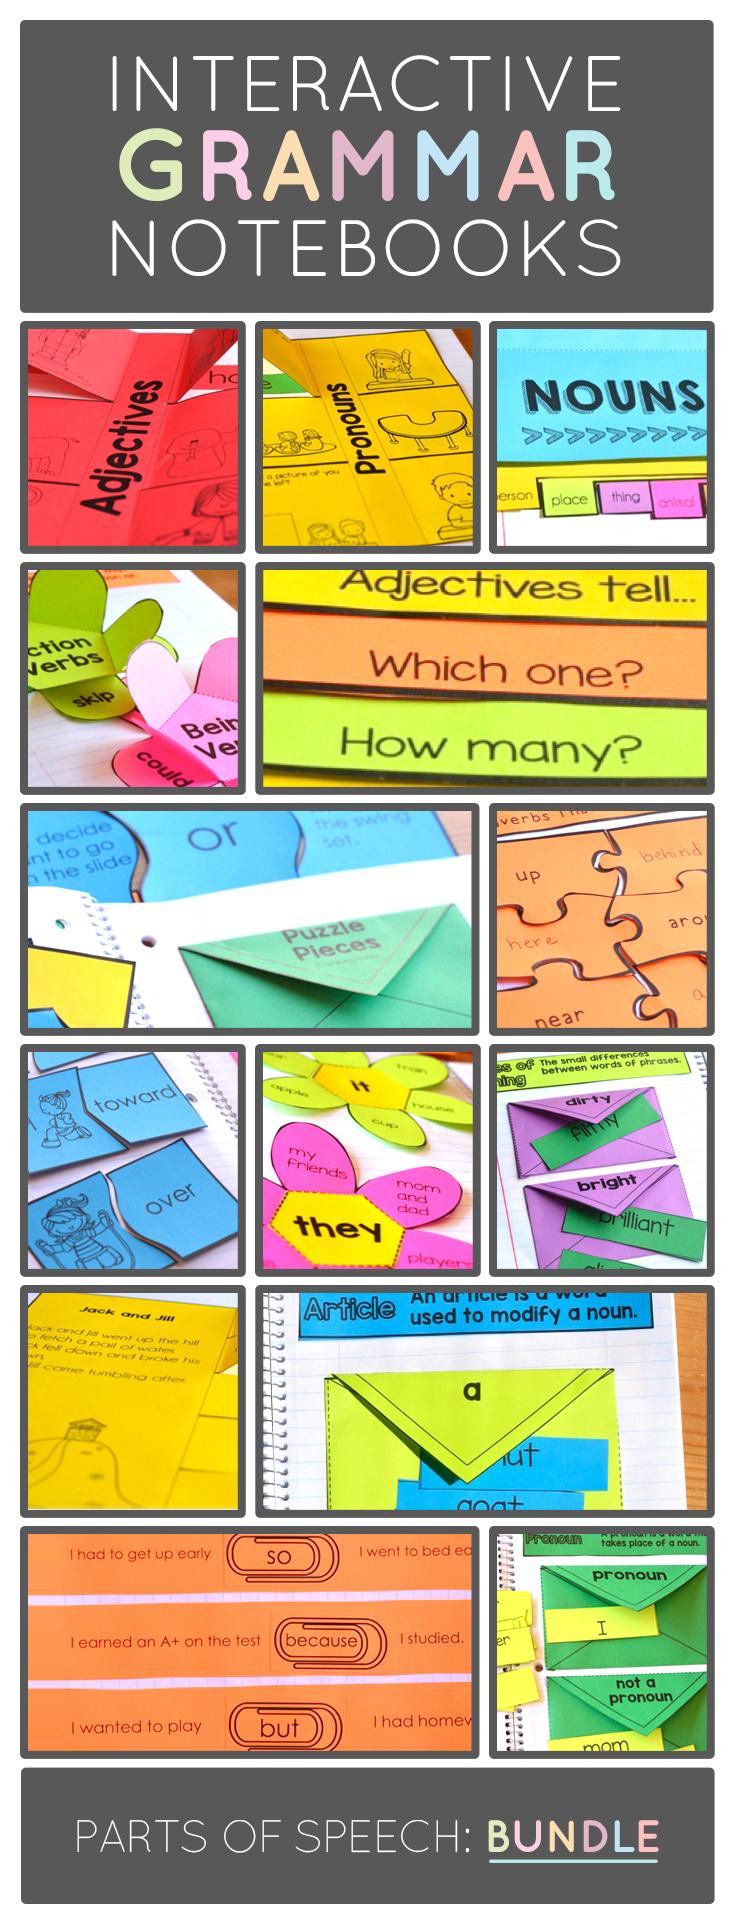 Interactive Grammar Notebook Resource for Primary Teachers